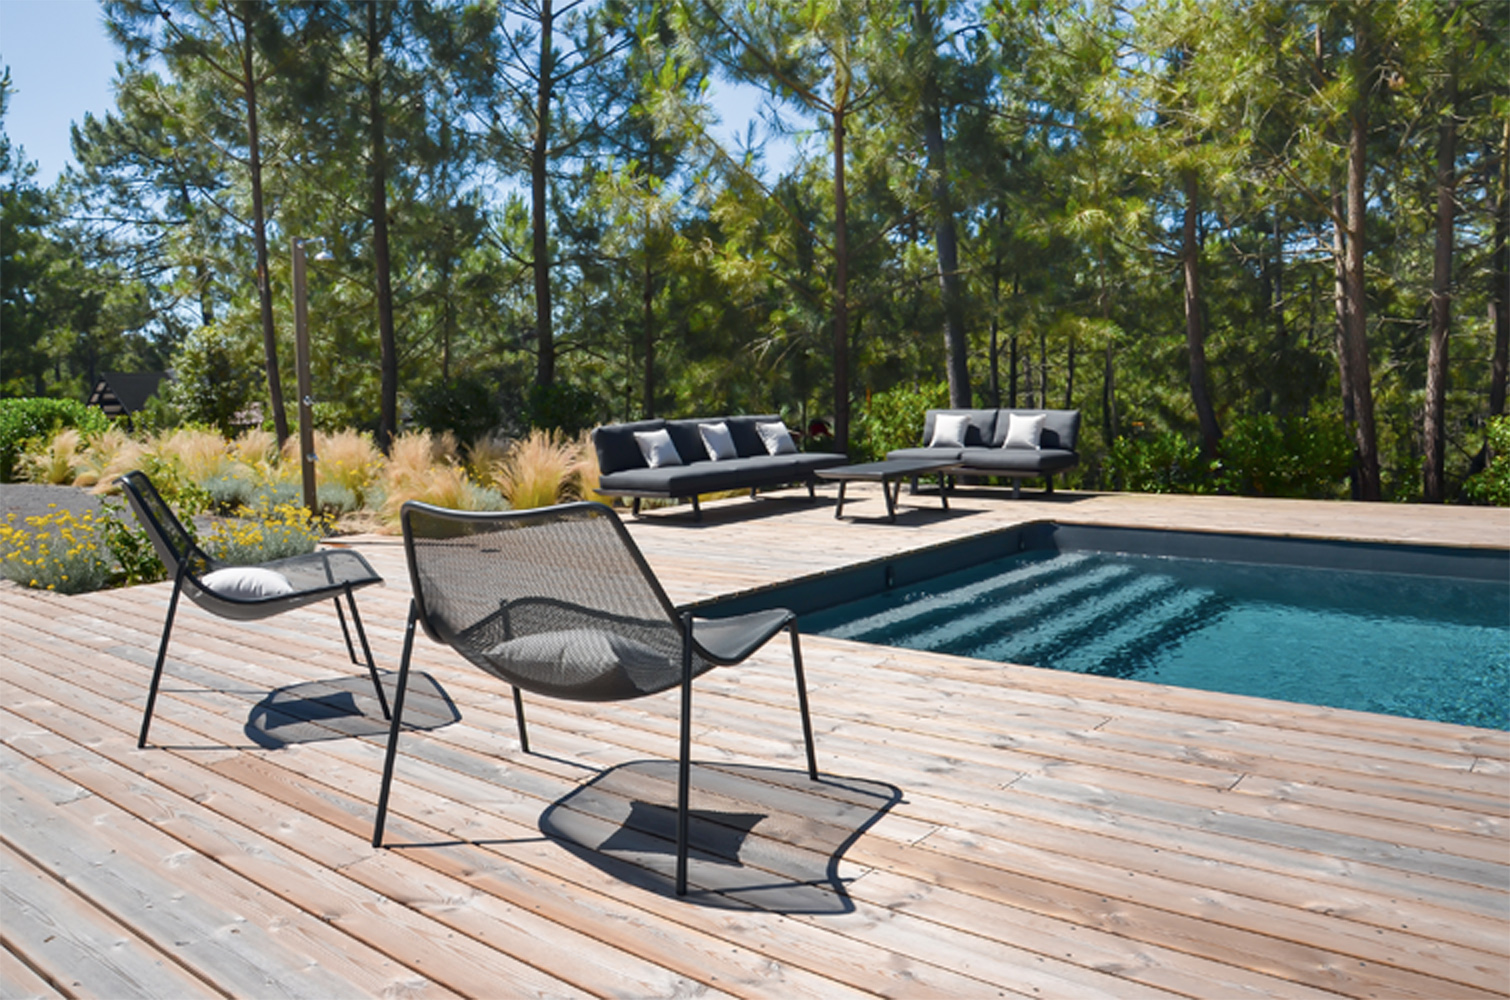 buxus-outdoor-image-avant-pins